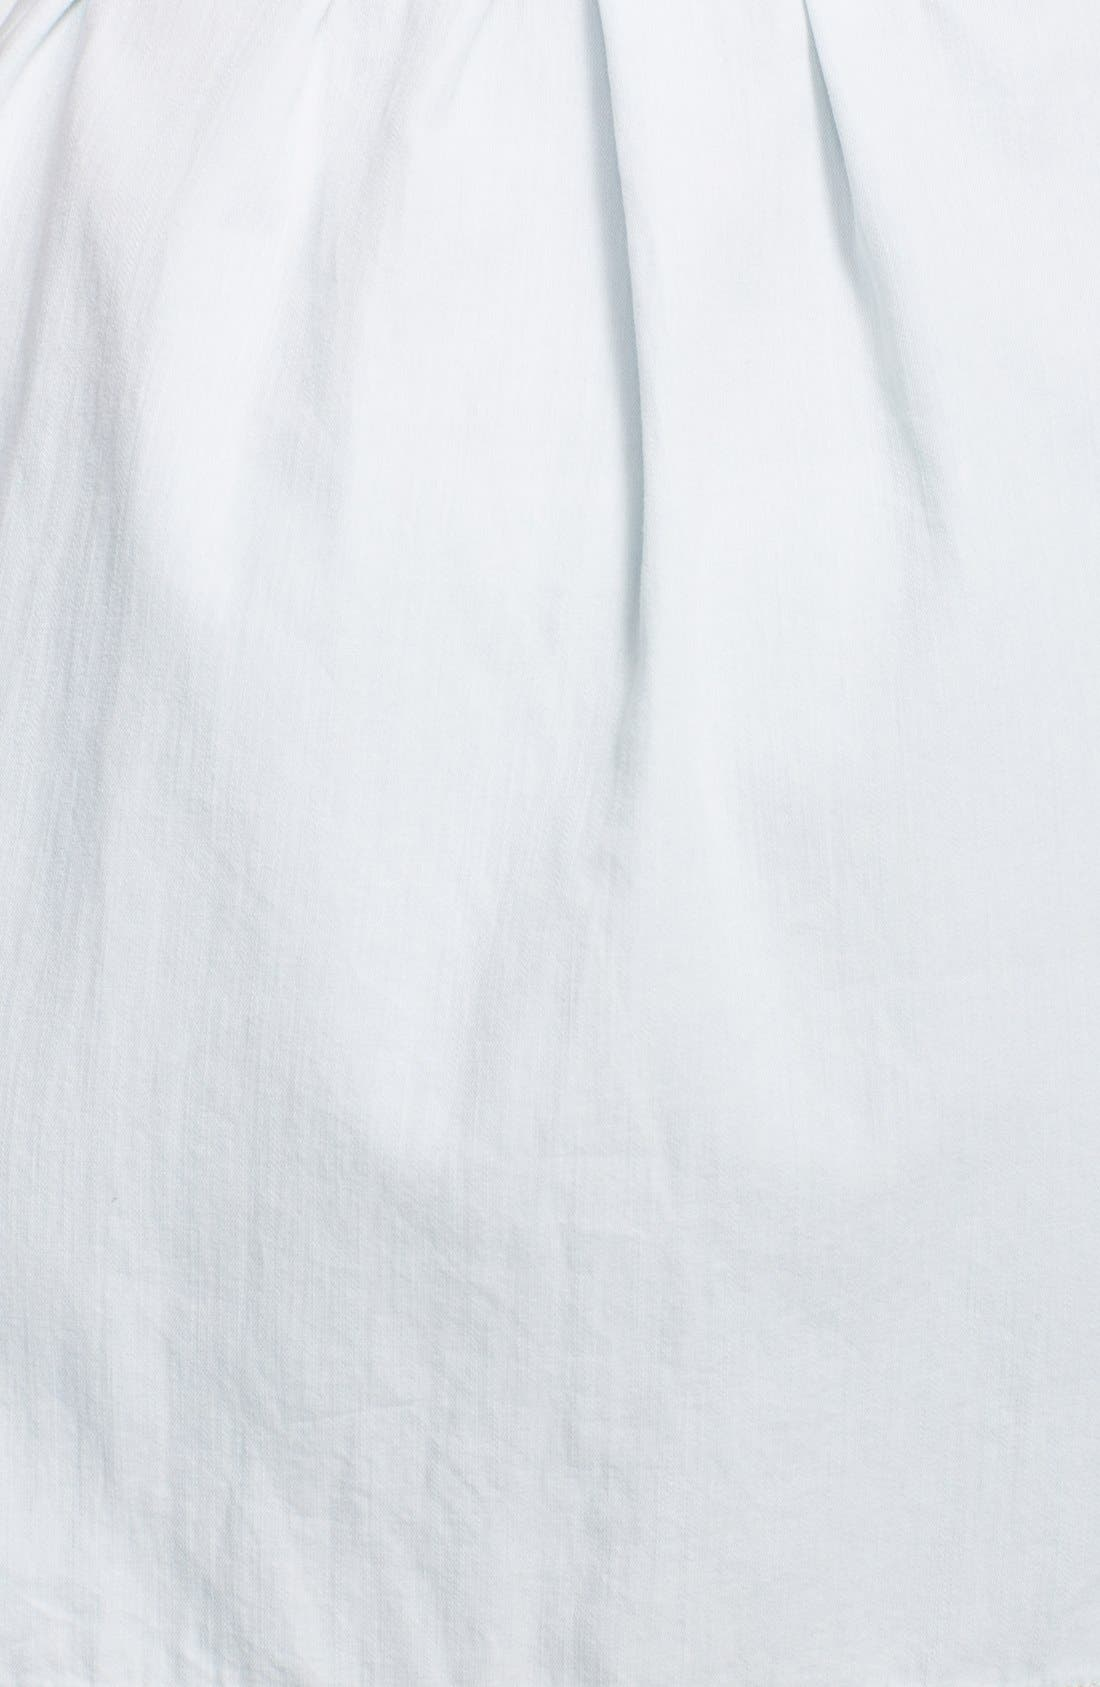 Alternate Image 3  - Current/Elliott 'The Craftsman Smock' Cotton Dress